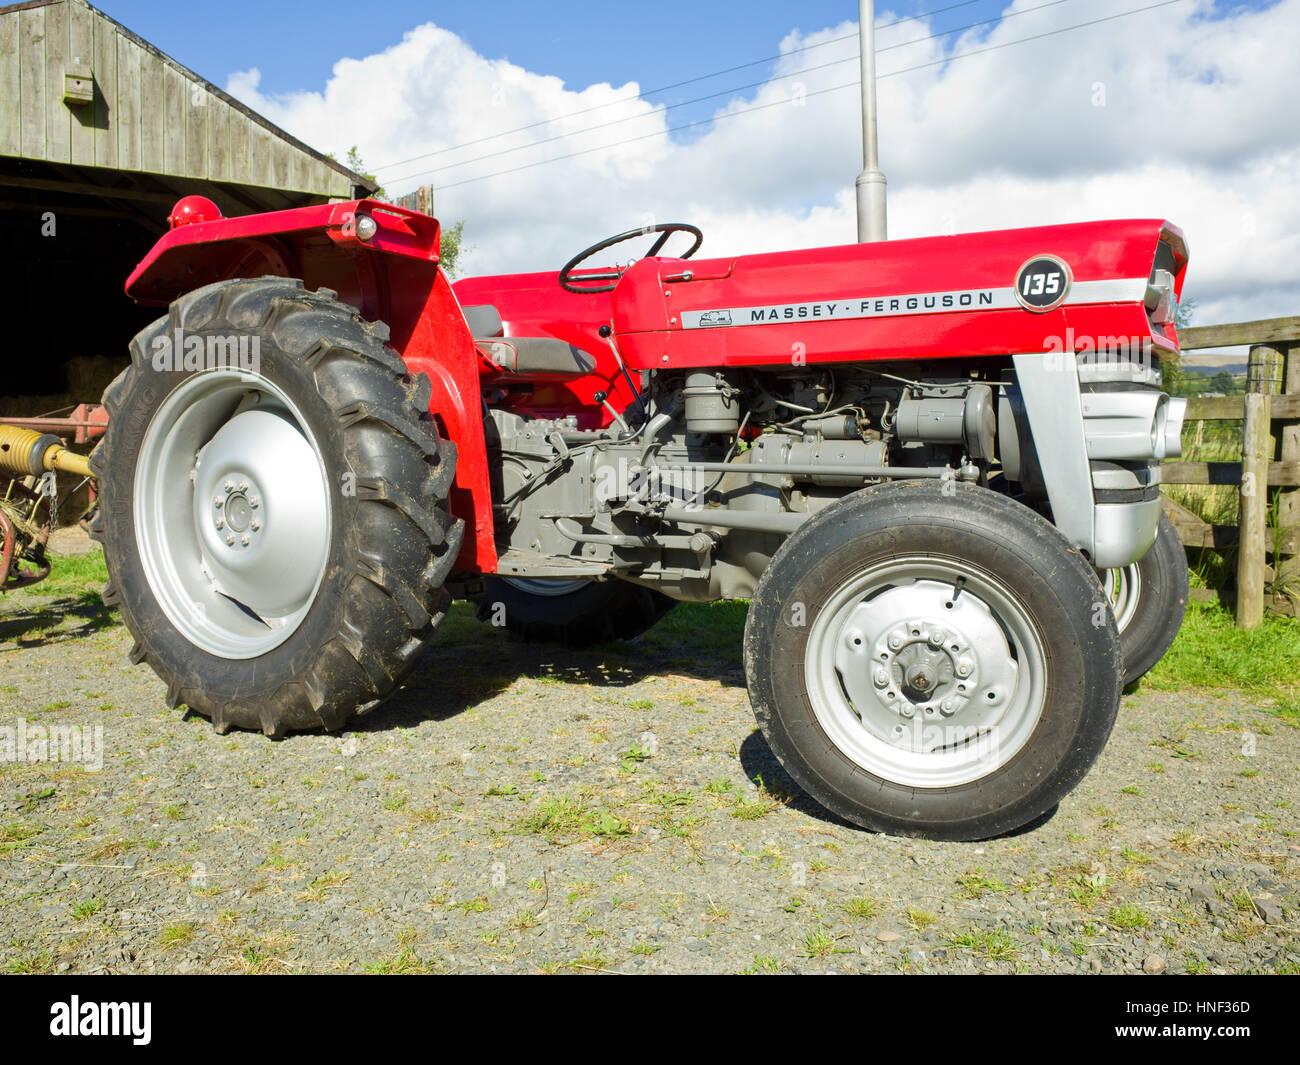 Classic Tractor Massey Ferguson 135 Stock Photo, Royalty